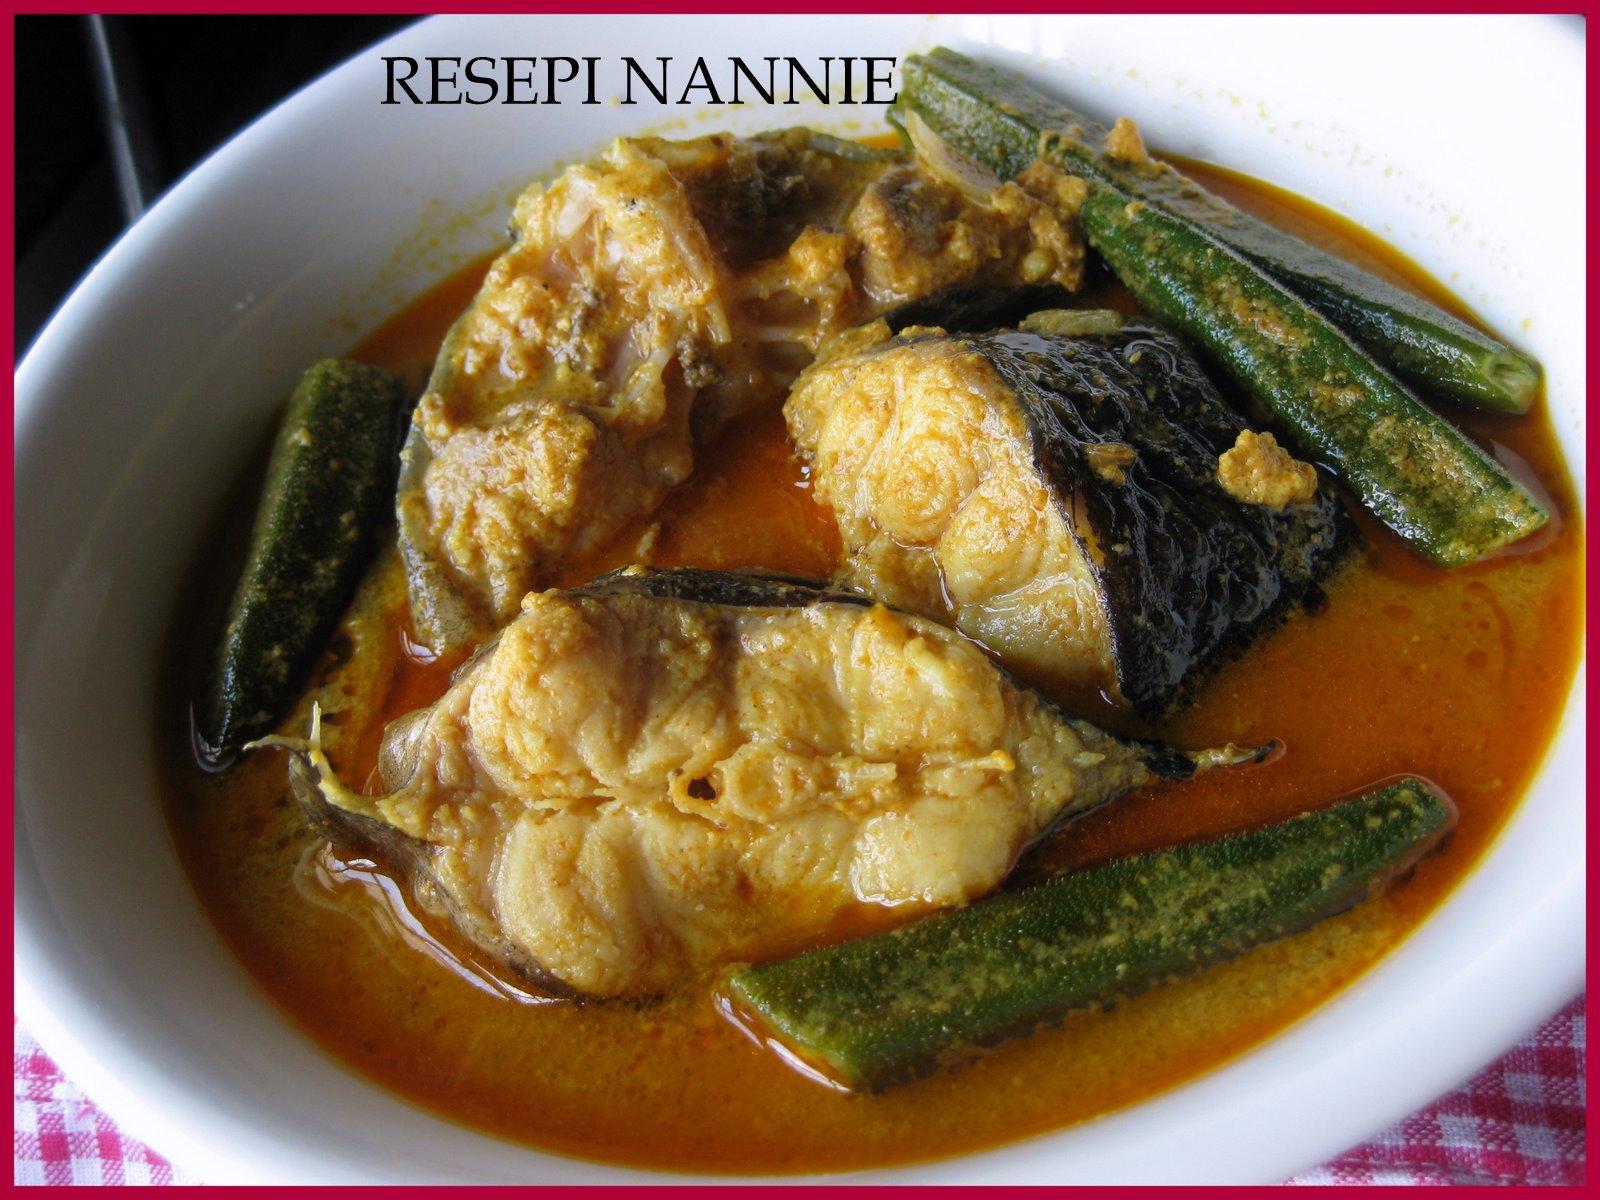 tumis.my - Resepi Pilihan Kategori masakan ikan